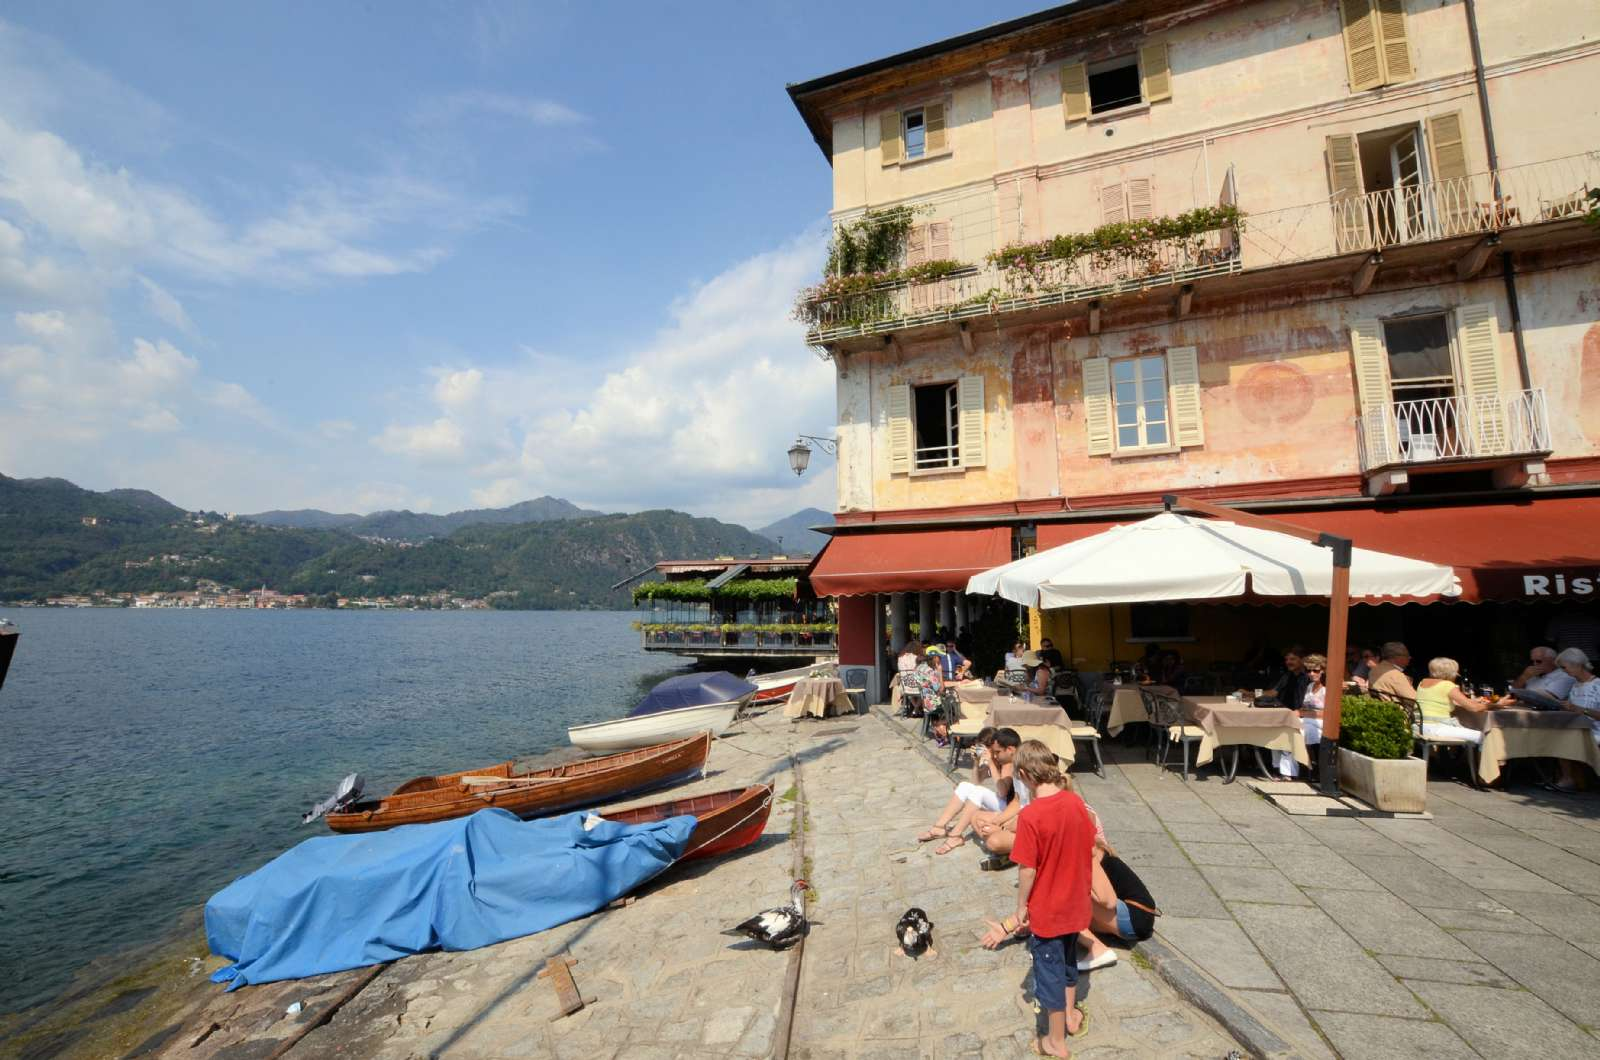 Torvepladsen Piazza Motta vender direkte ud mod søen